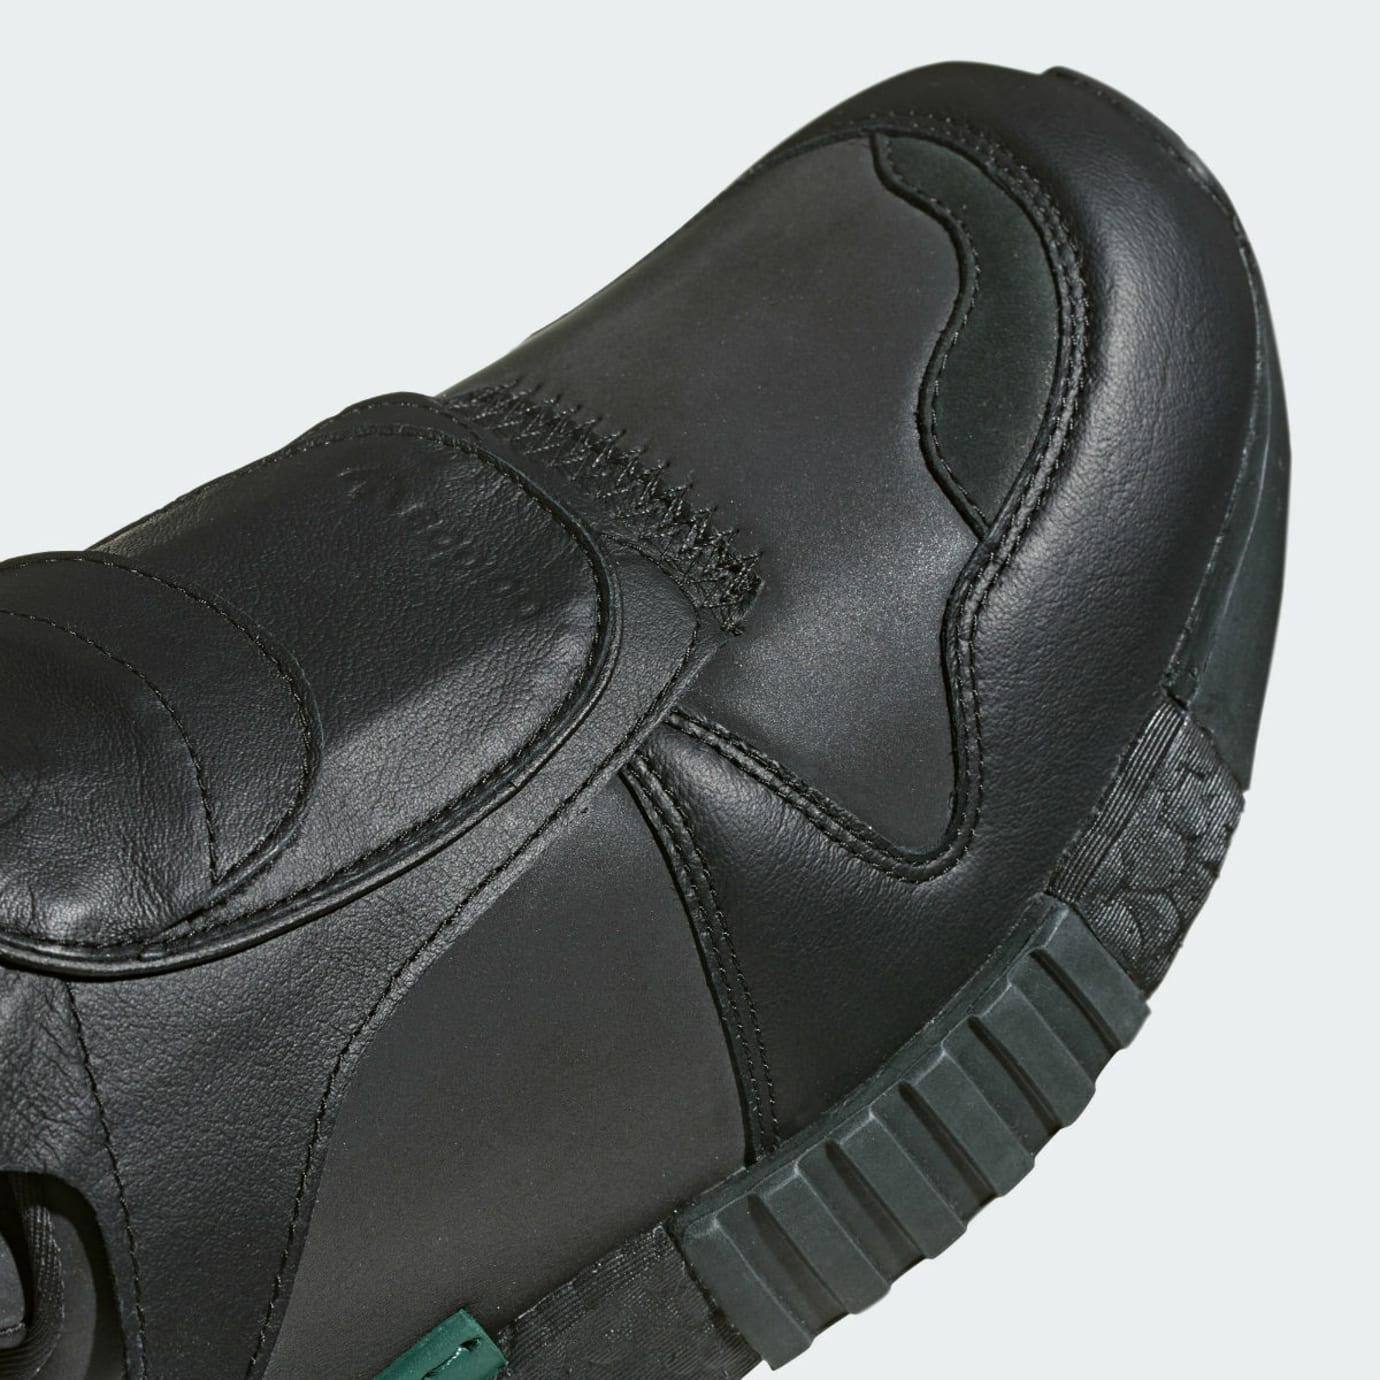 quality design d039d 018ef Image via Adidas Adidas Futurepacer Black Release Date B37266 Toe